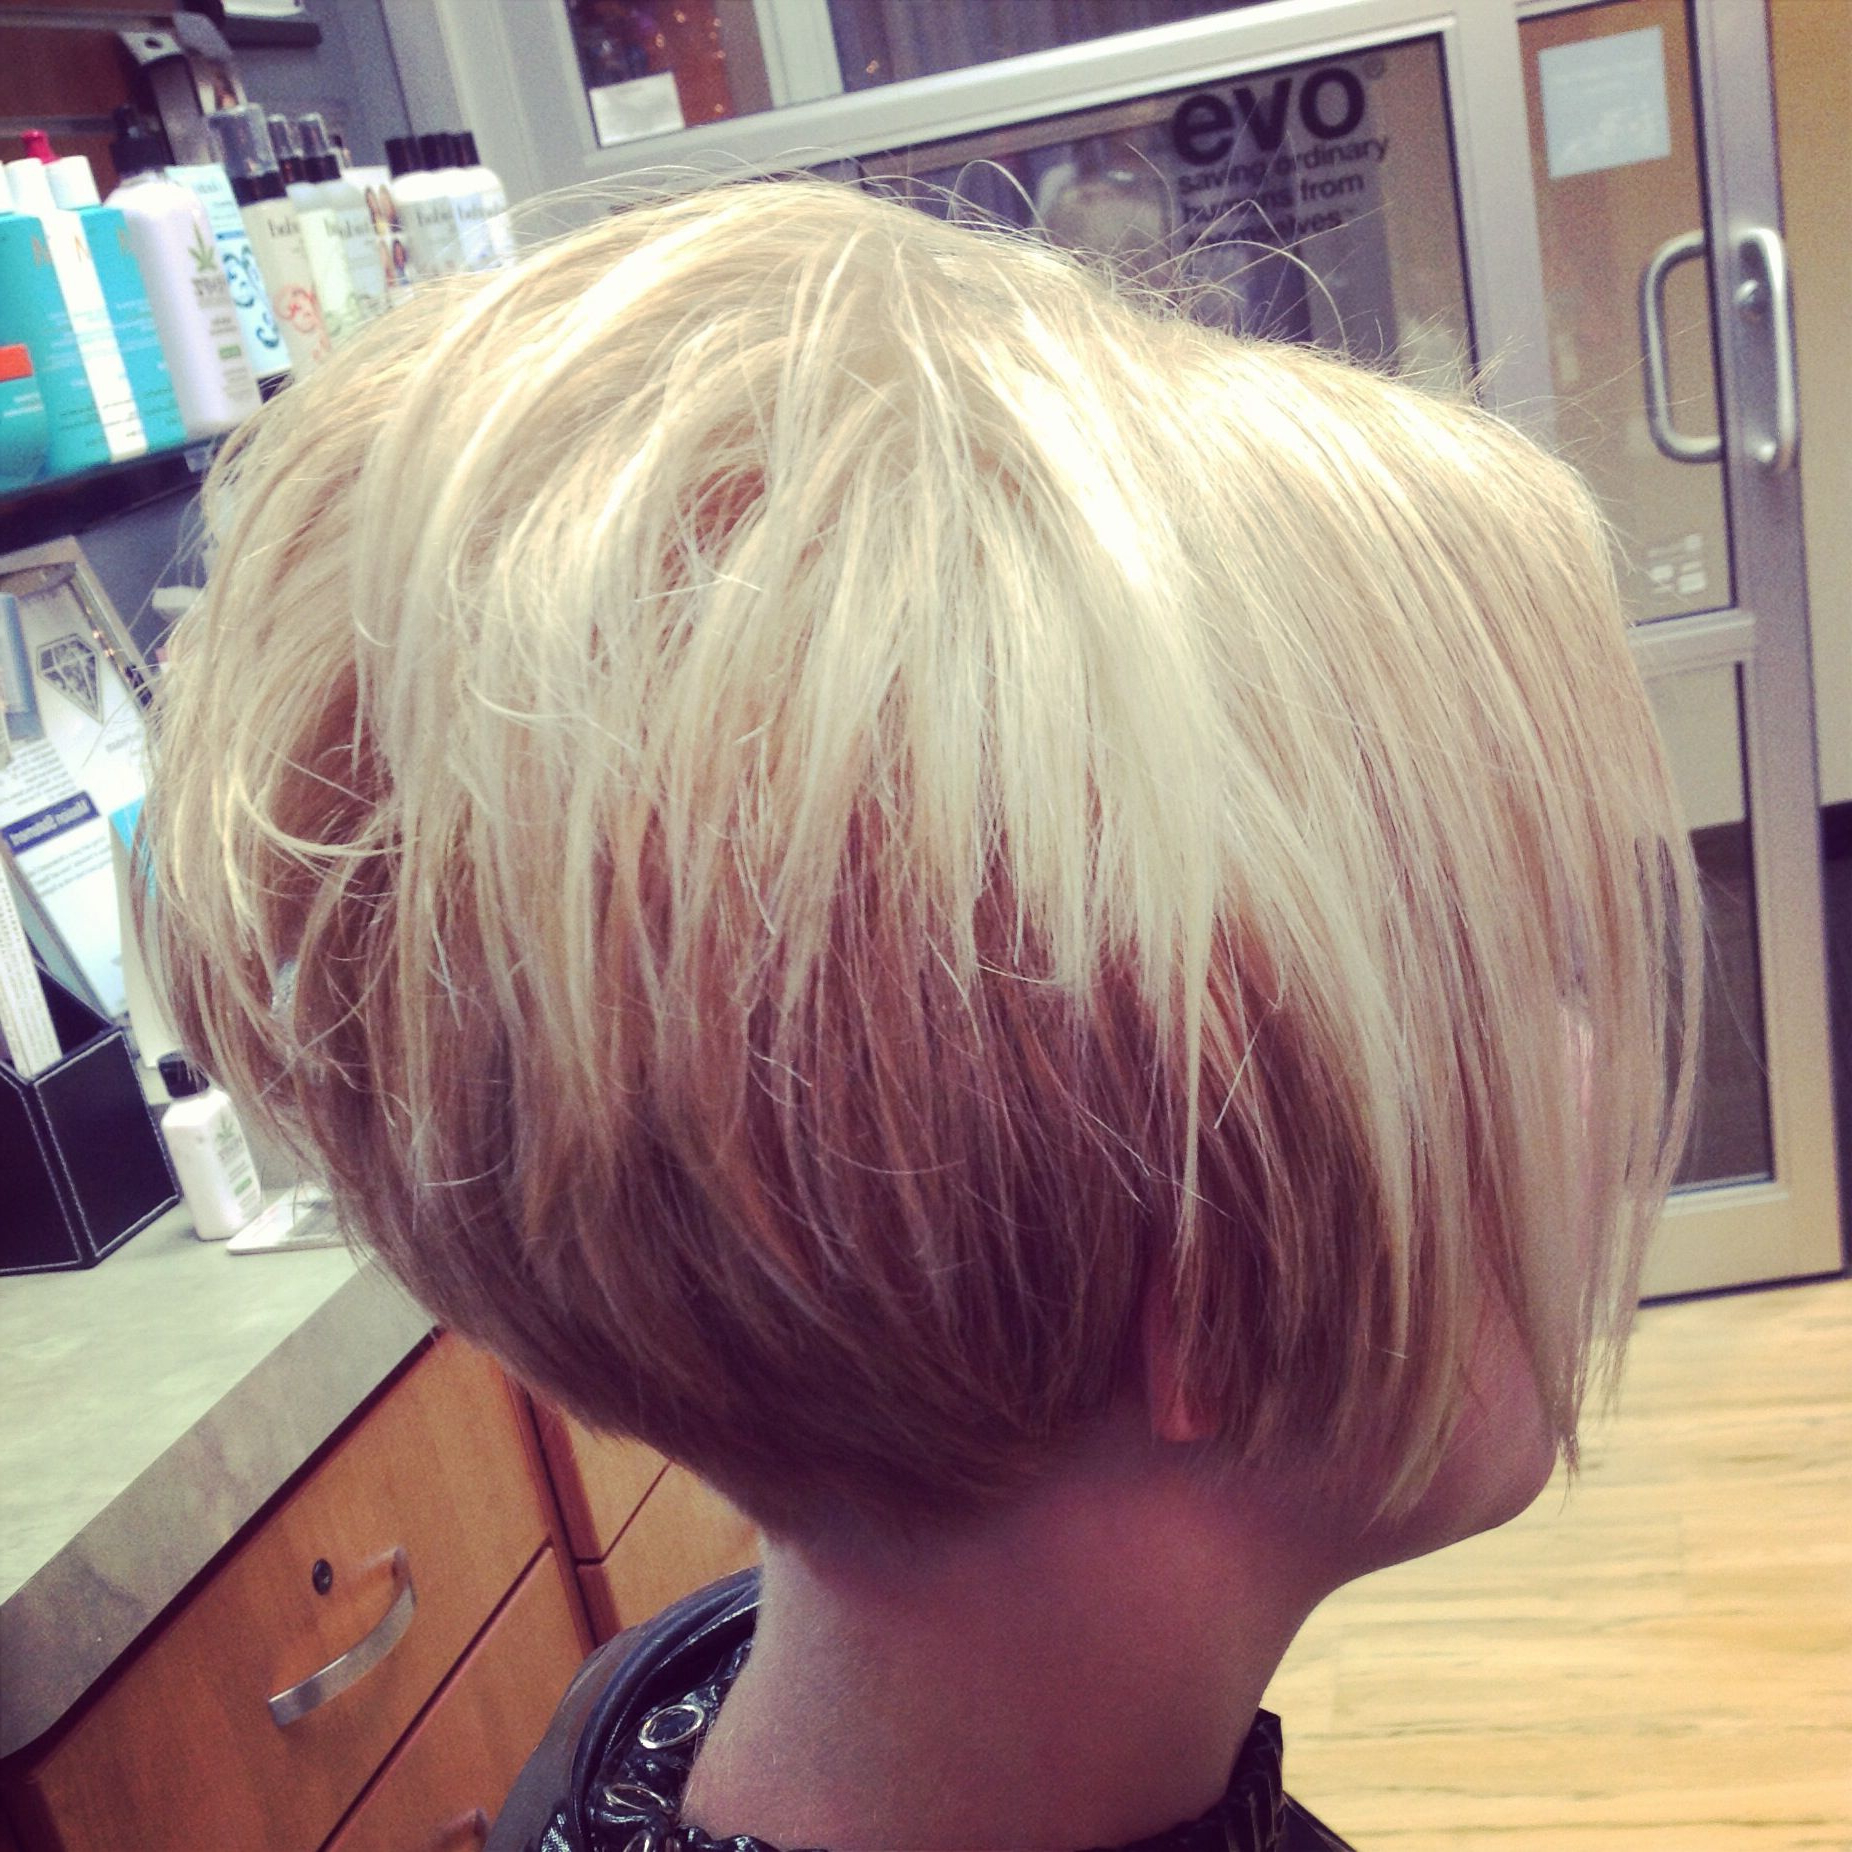 Fashion : Most Captivating Cropped Platinum Blonde Bob Throughout Popular Short Platinum Blonde Bob Hairstyles (Gallery 13 of 20)